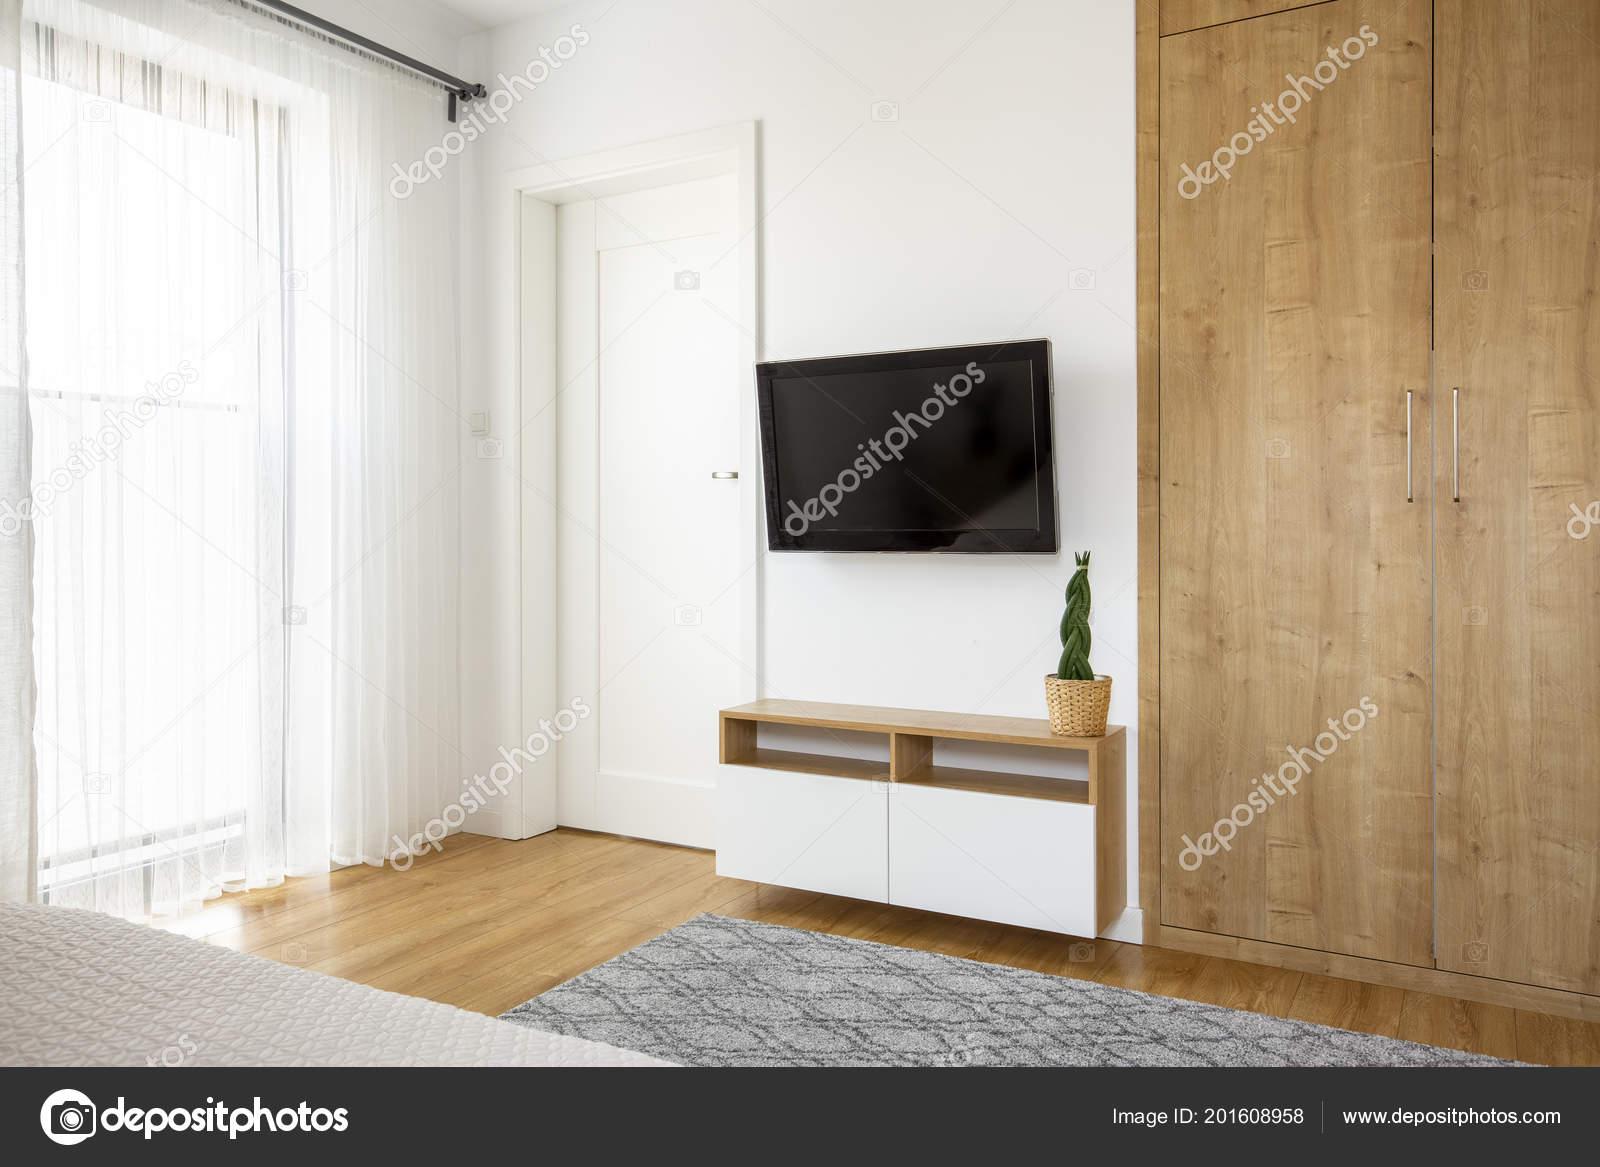 Picture of: Wooden Wardrobe Next Television White Wall Hotel Bedroom Interior Door Stock Photo C Photographee Eu 201608958